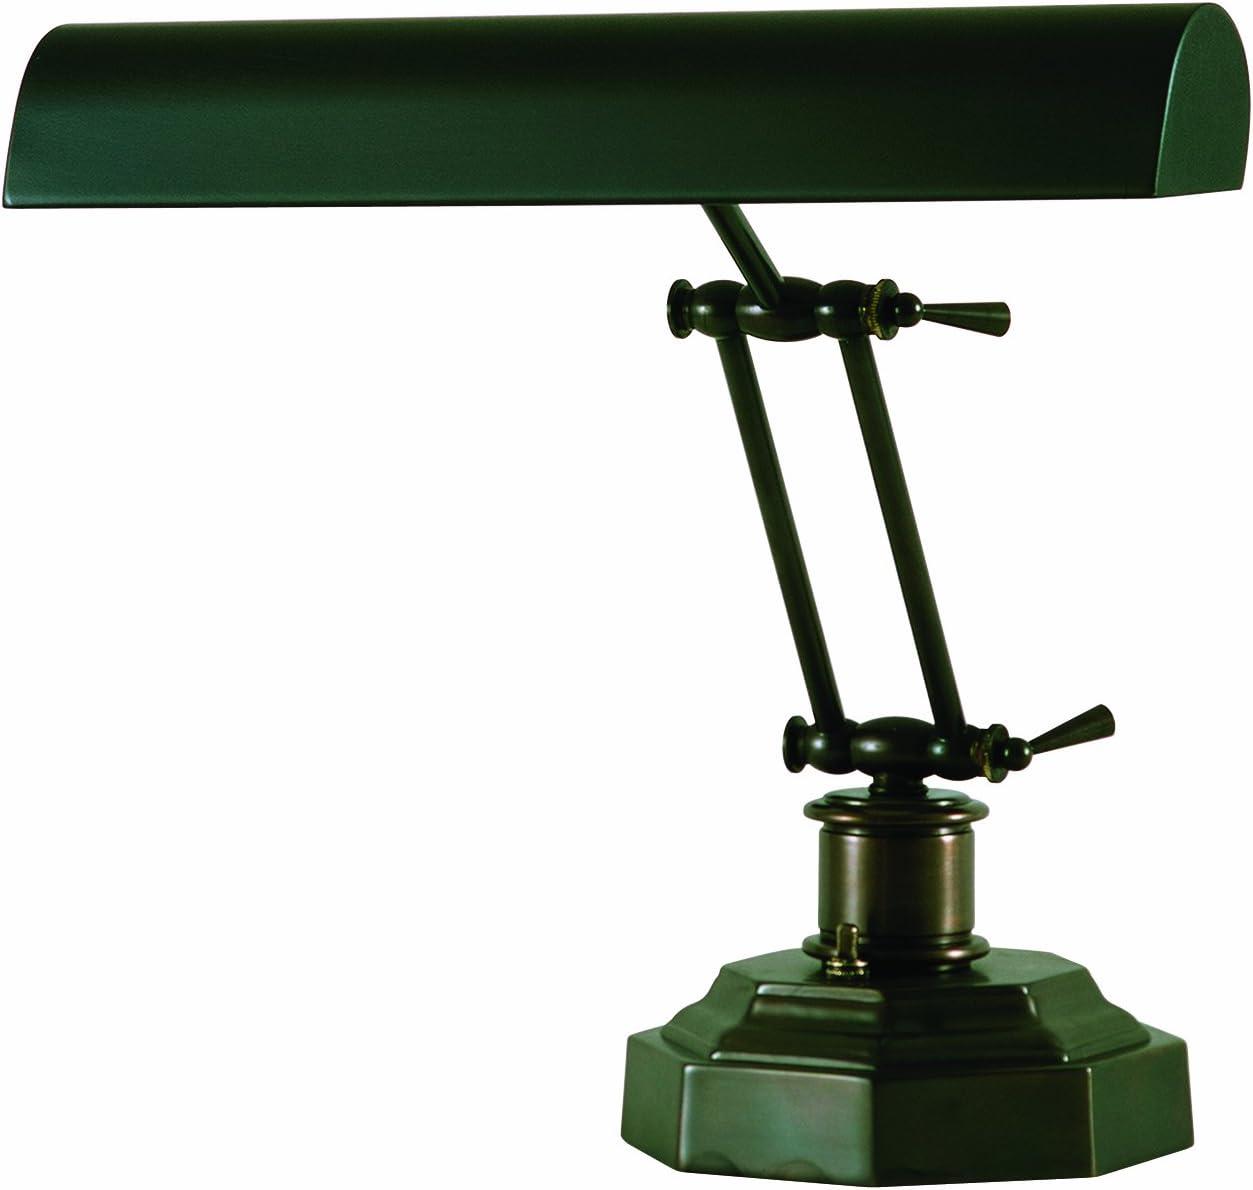 House of Troy P14-203-81 12-1 2-Inch Portable Desk Piano Lamp Mahogany Bronze